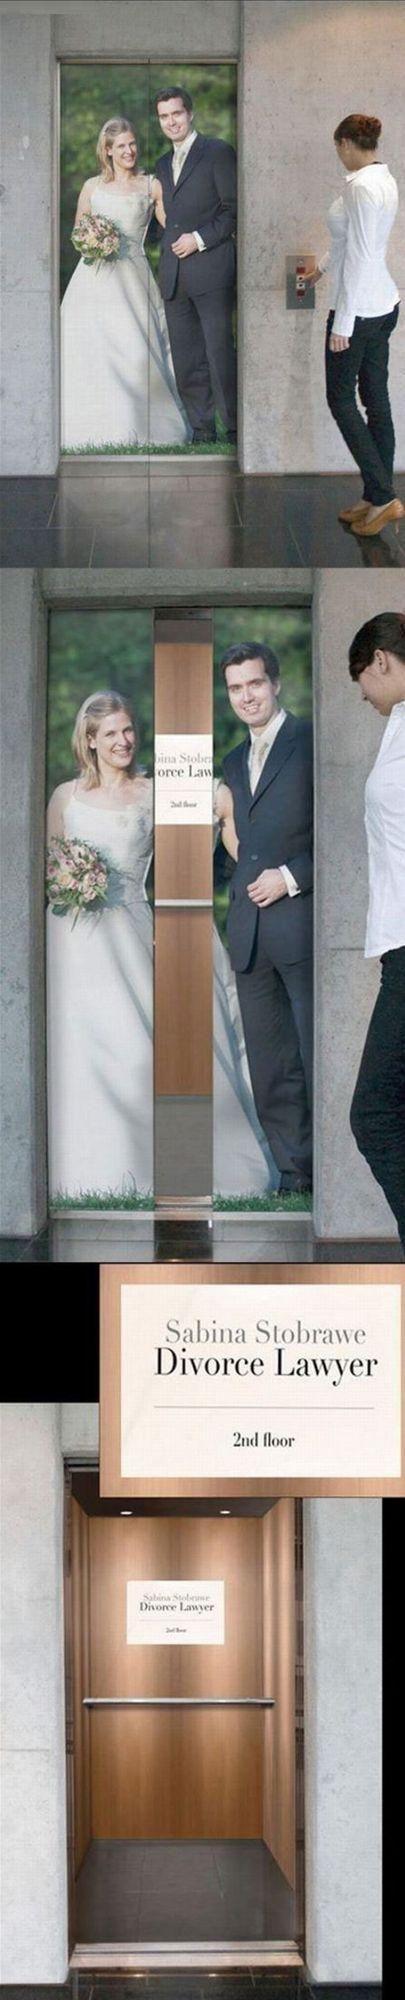 Best Divorce Lawyer Advertising - Law -C. BRADFORD LAW FIRM (424) 703-3416